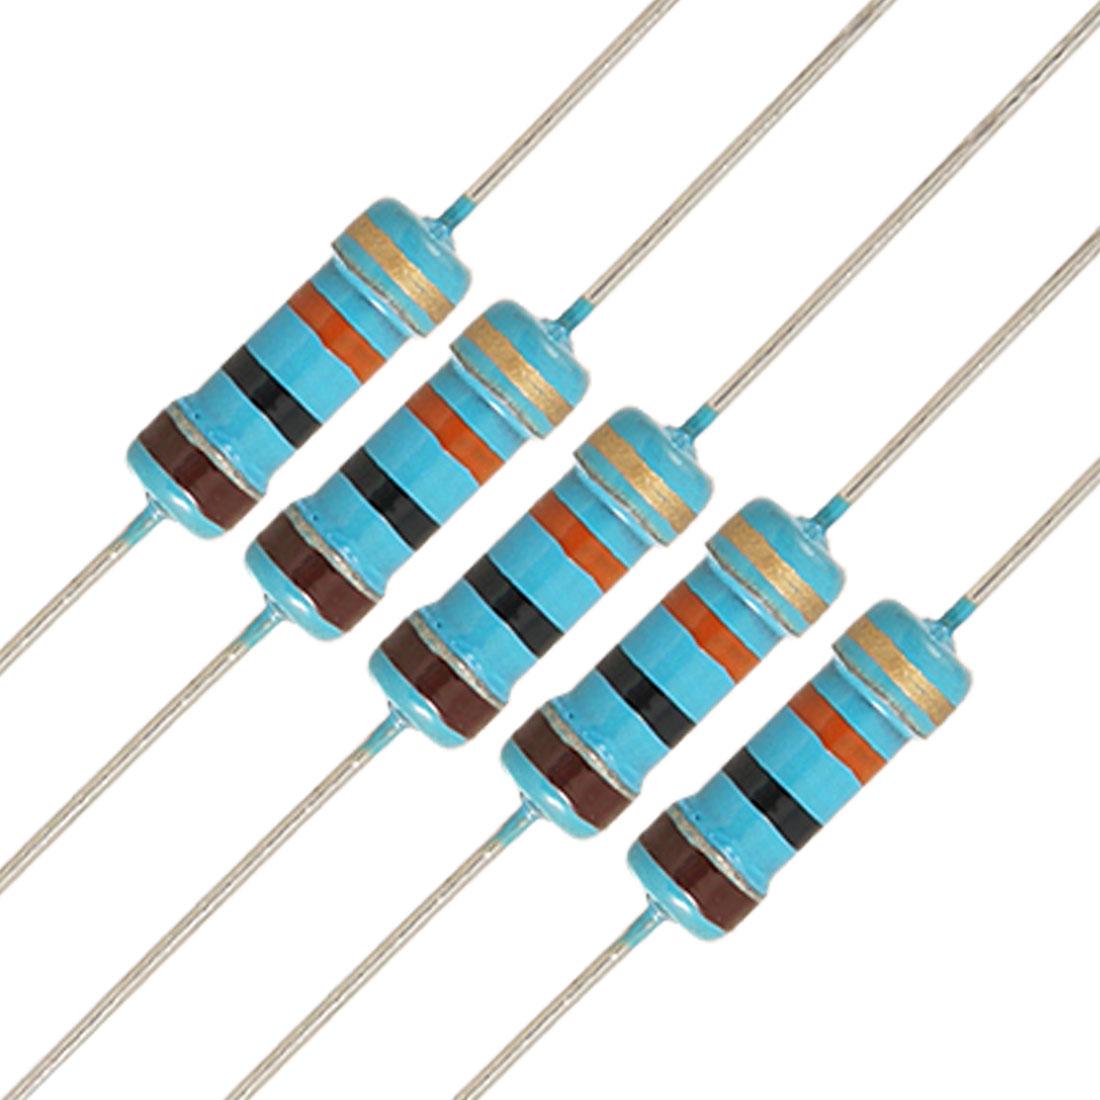 20 x 1/2W Watt 10K ohm 10KR Carbon Film Resistor 0.5W